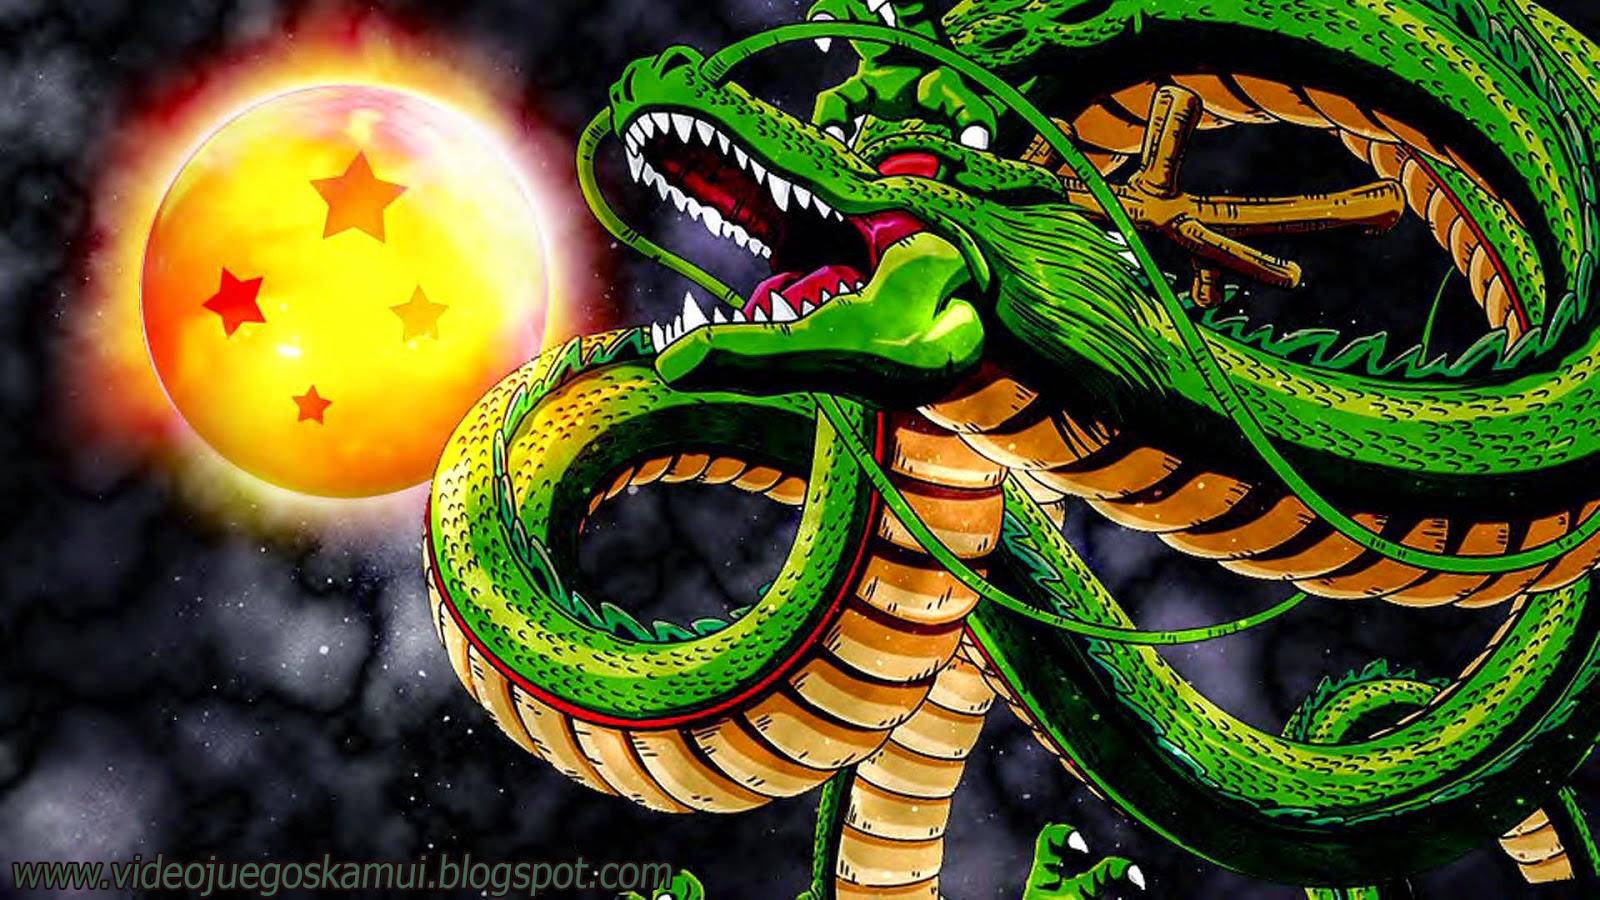 Hd wallpaper dragon ball super - Todos Los Fondos De Pantalla Hd Dragon Ball Z